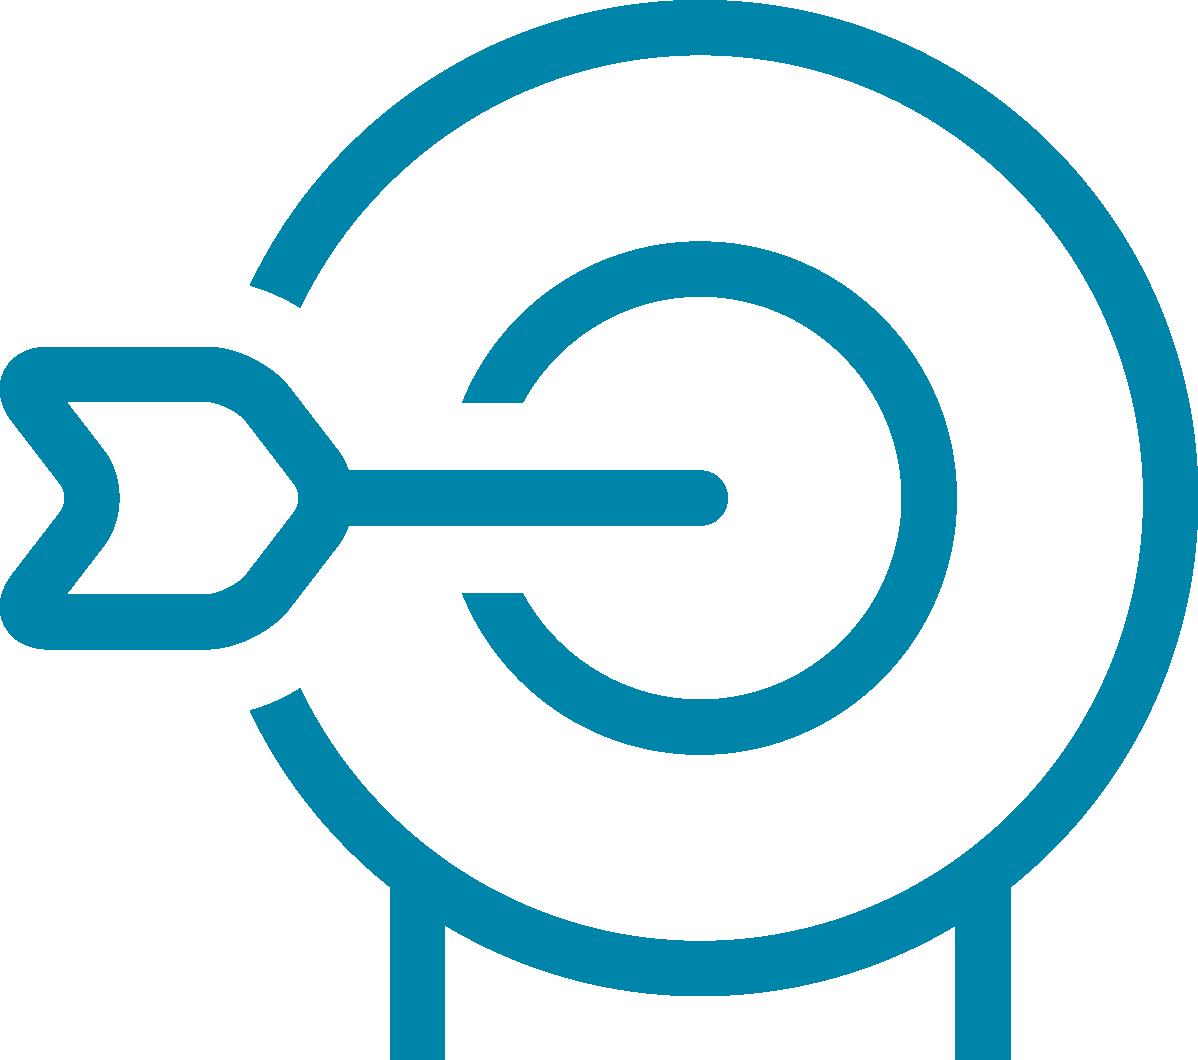 blue-target-icon-1